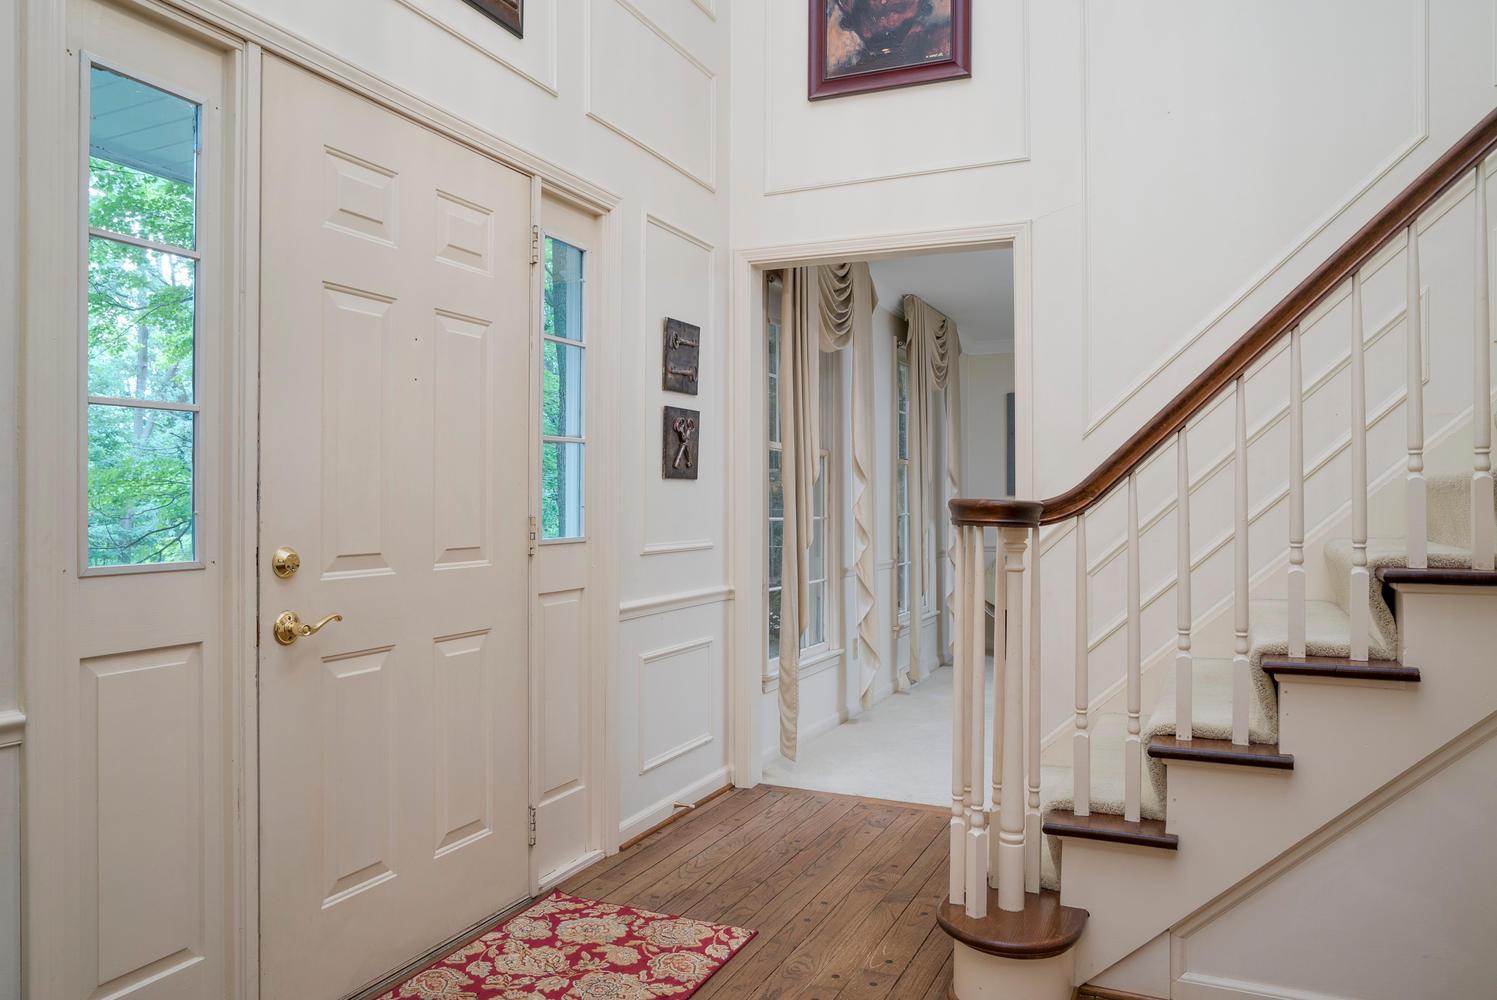 36 Timberlake Dr Orchard Park-large-003-4-Foyer-1498x1000-72dpi